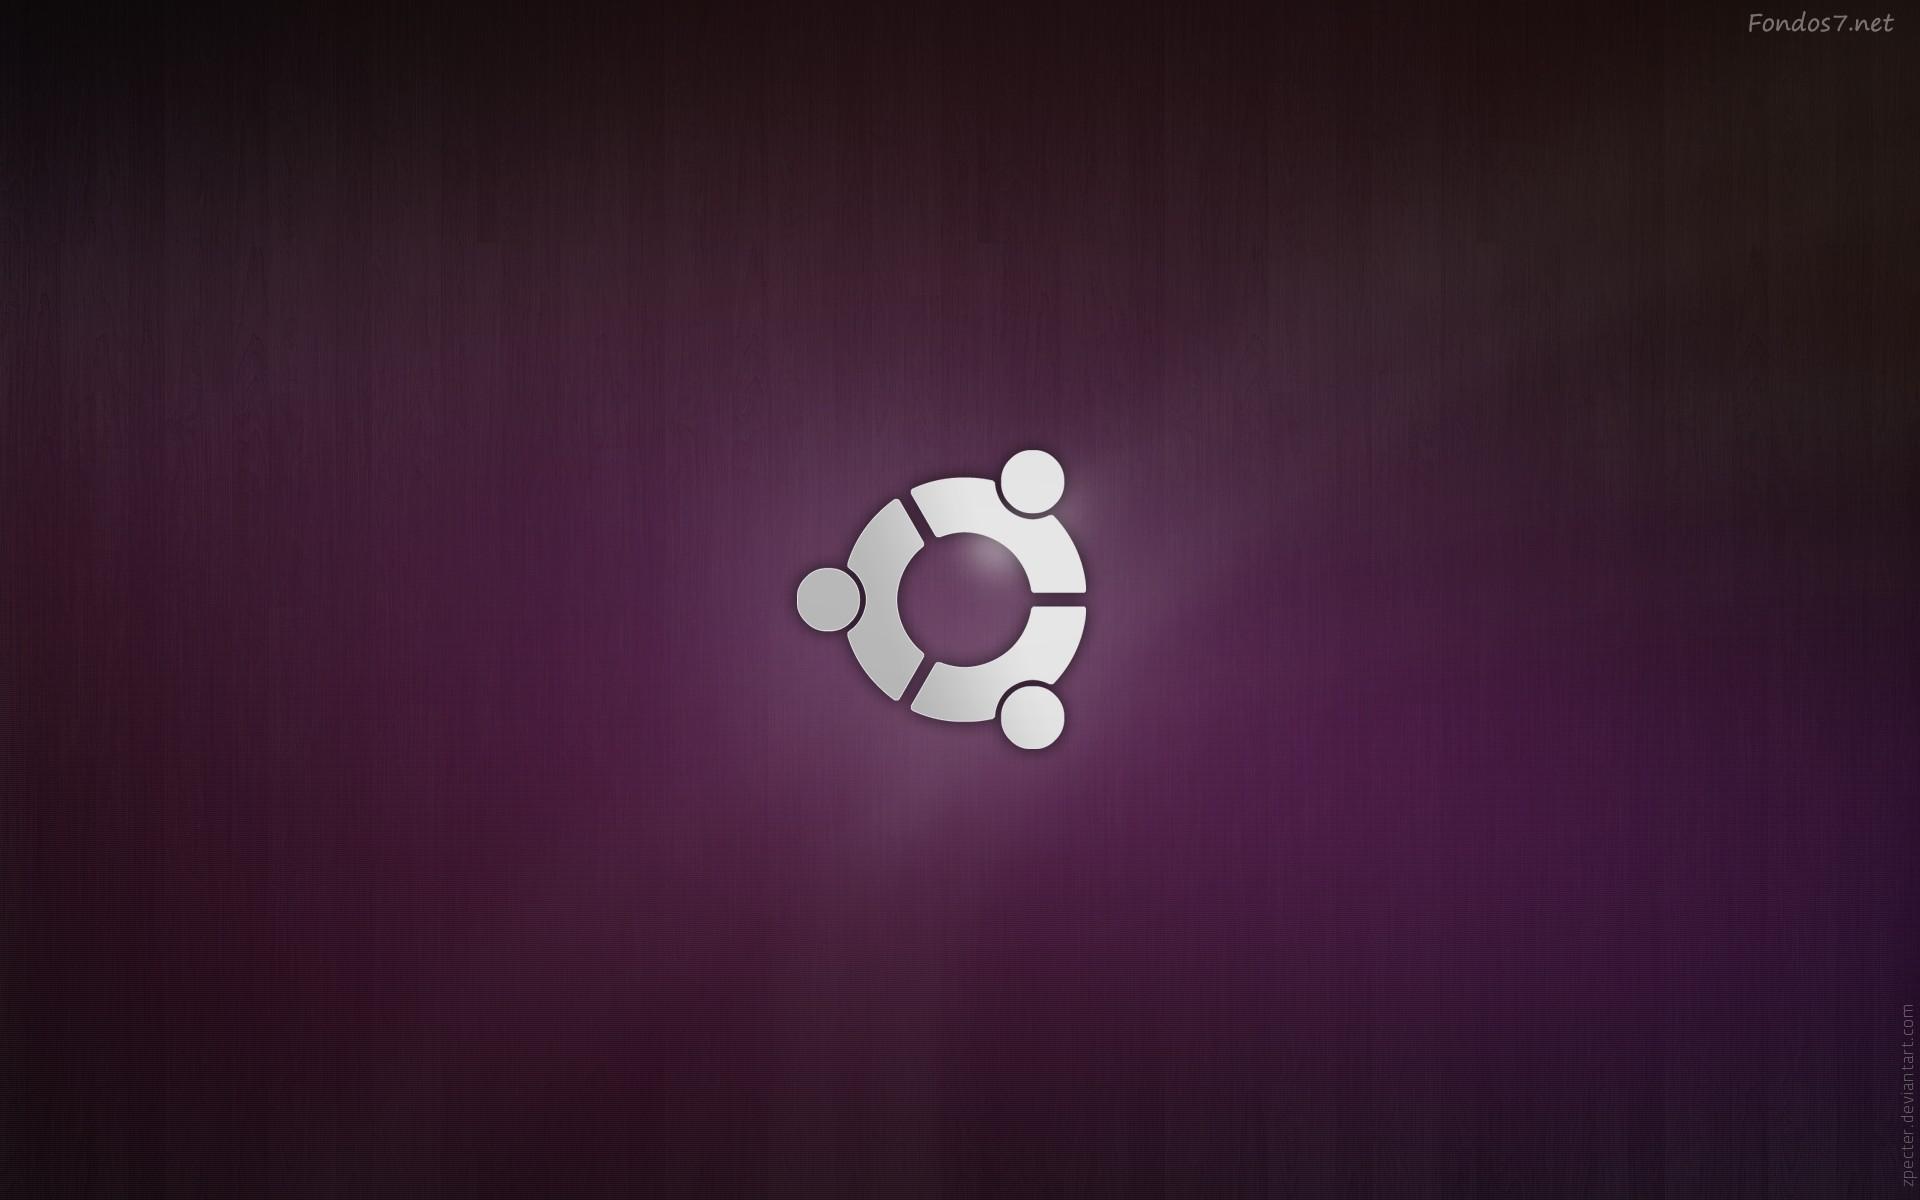 final linux ubuntu wallpaper widescreen wallpapers fondos7 .